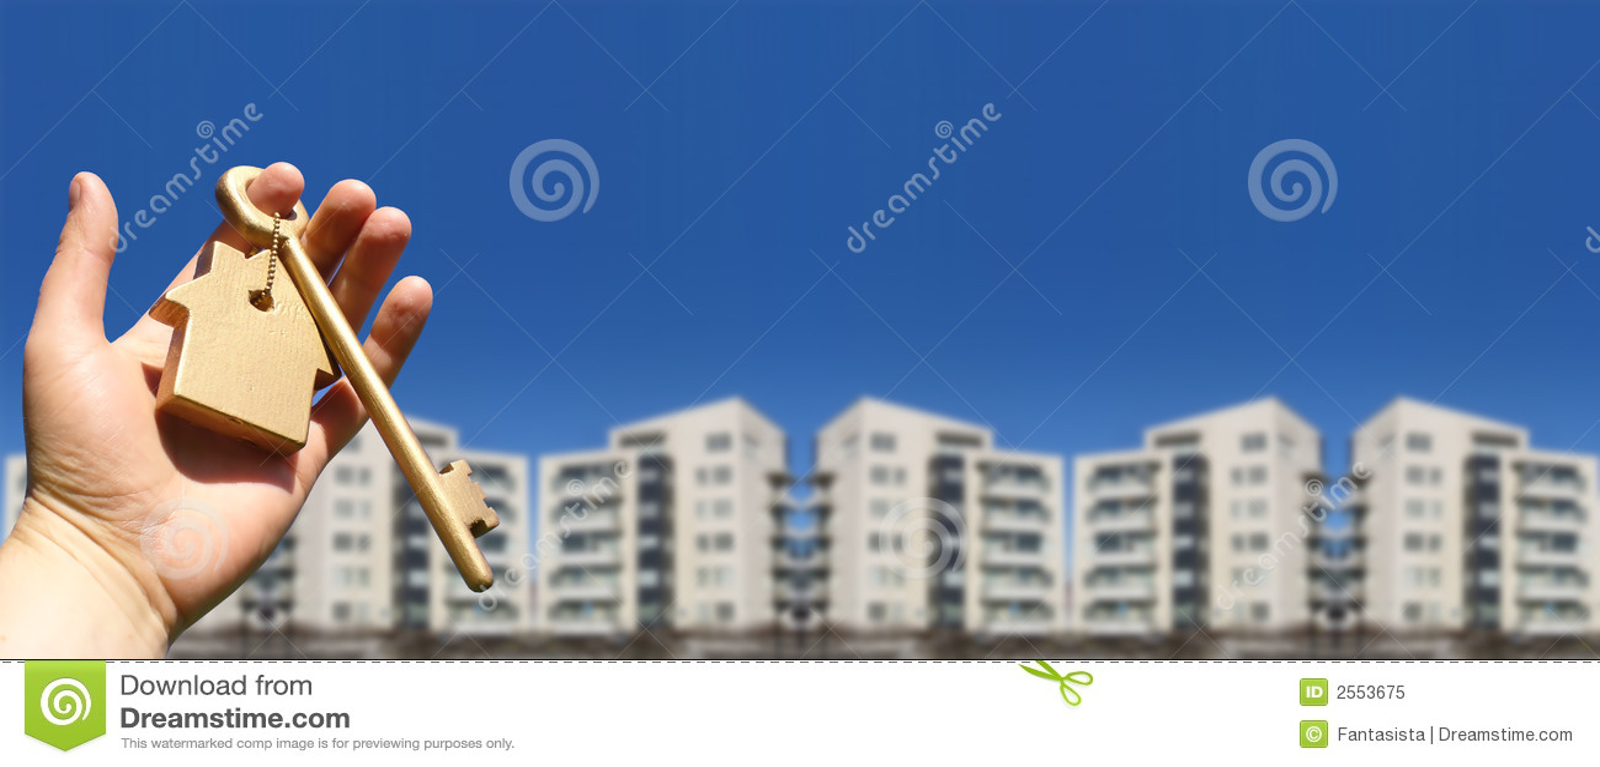 Metaphor for a home?